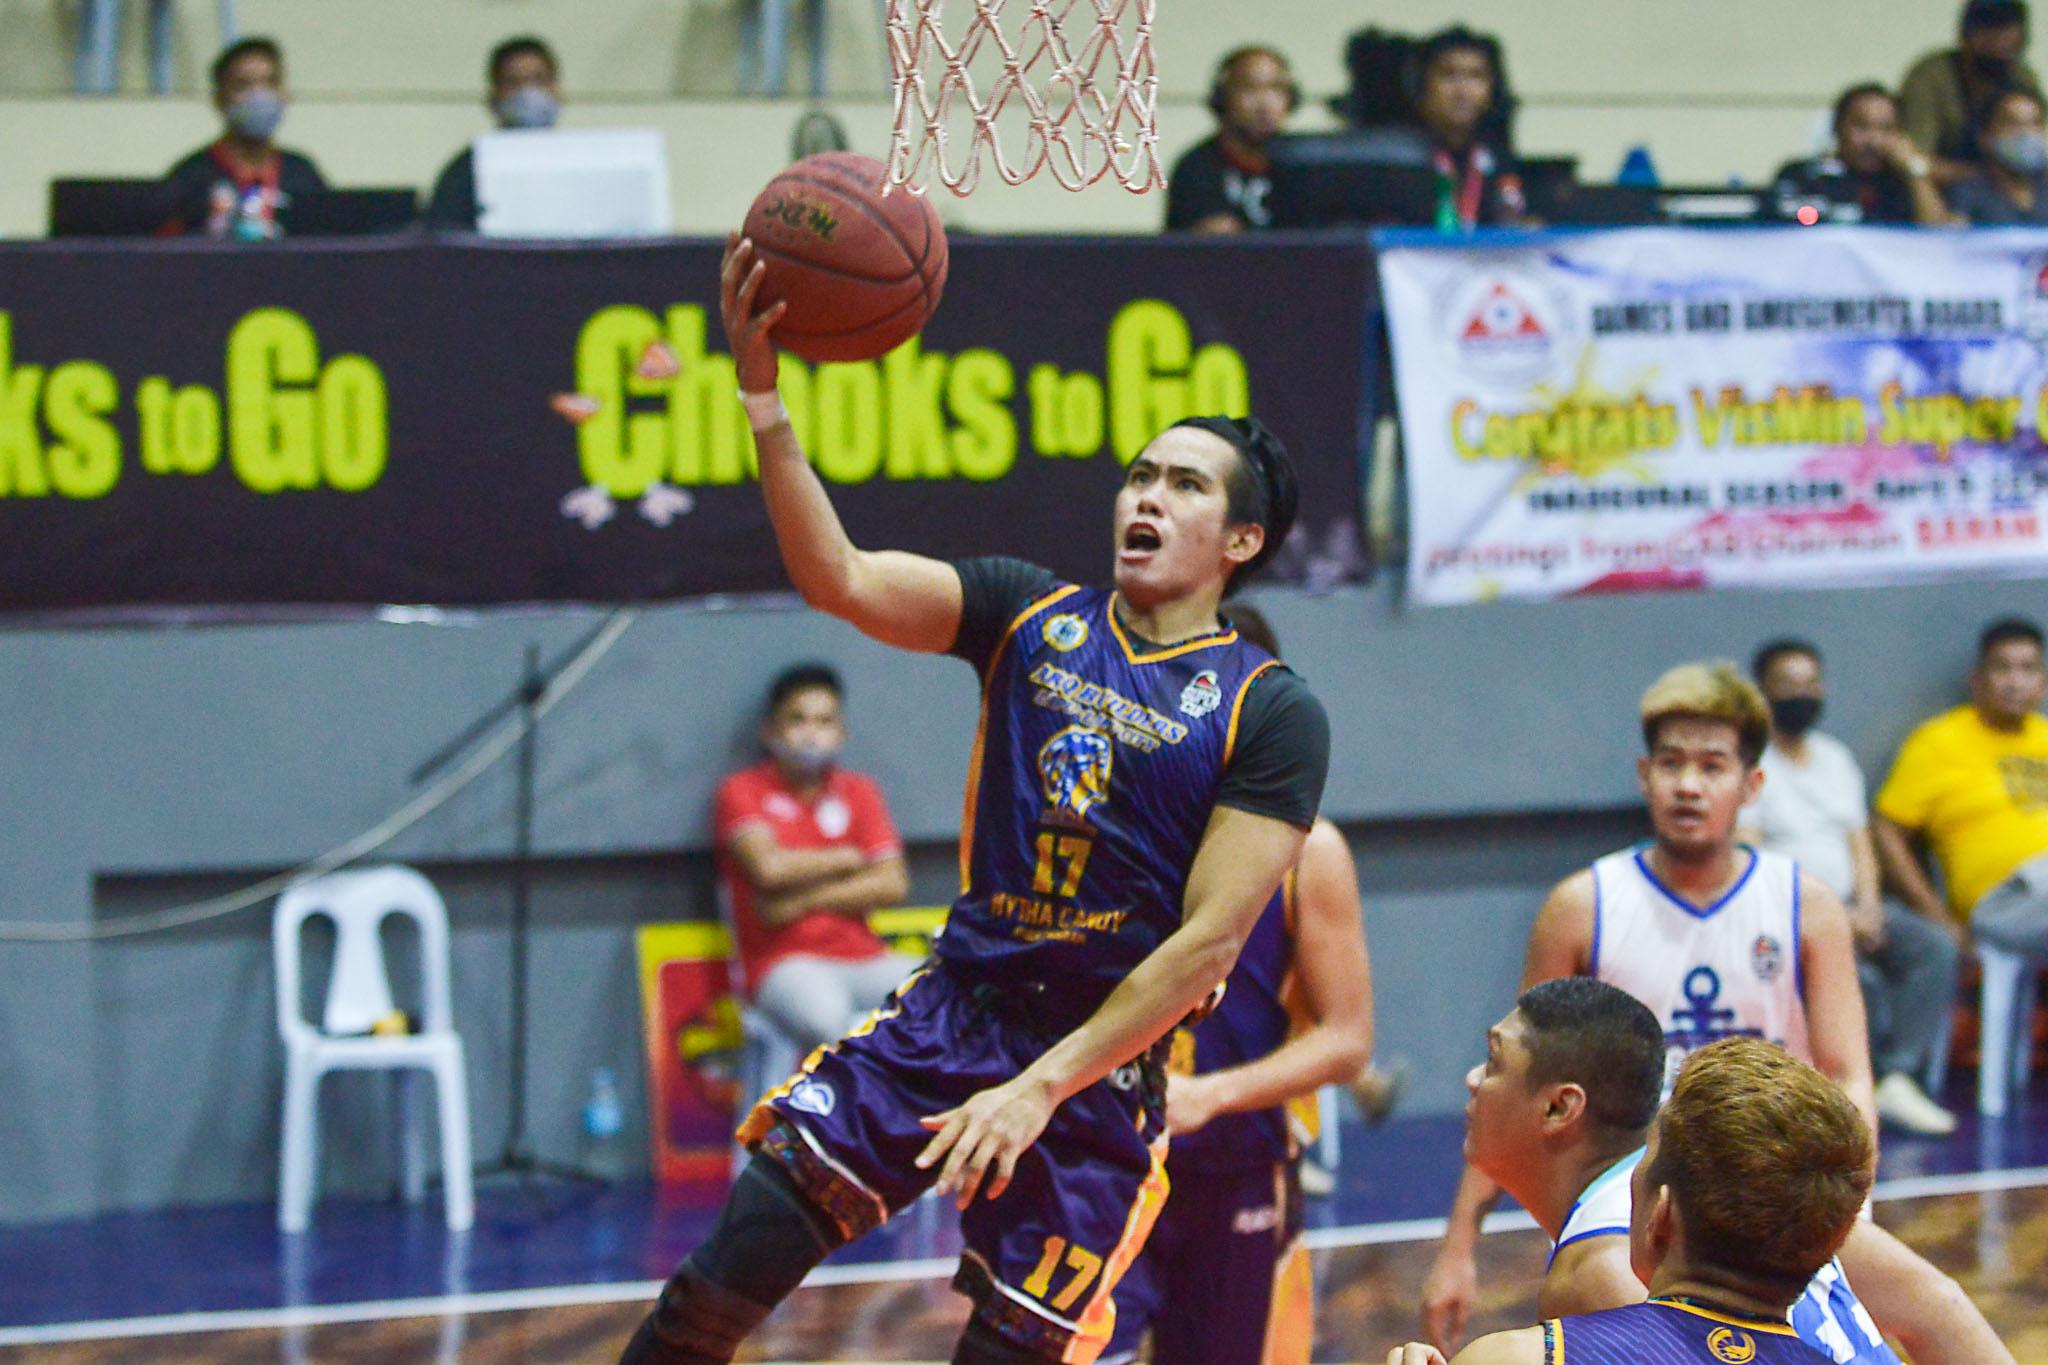 2021-Chooks-to-Go-VisMin-Cup-Tubigon-Bohol-vs-Lapu-Lapu-Rendell-Senining Senining grateful to 'second family' for helping redeem him Basketball News VisMin Super Cup  - philippine sports news